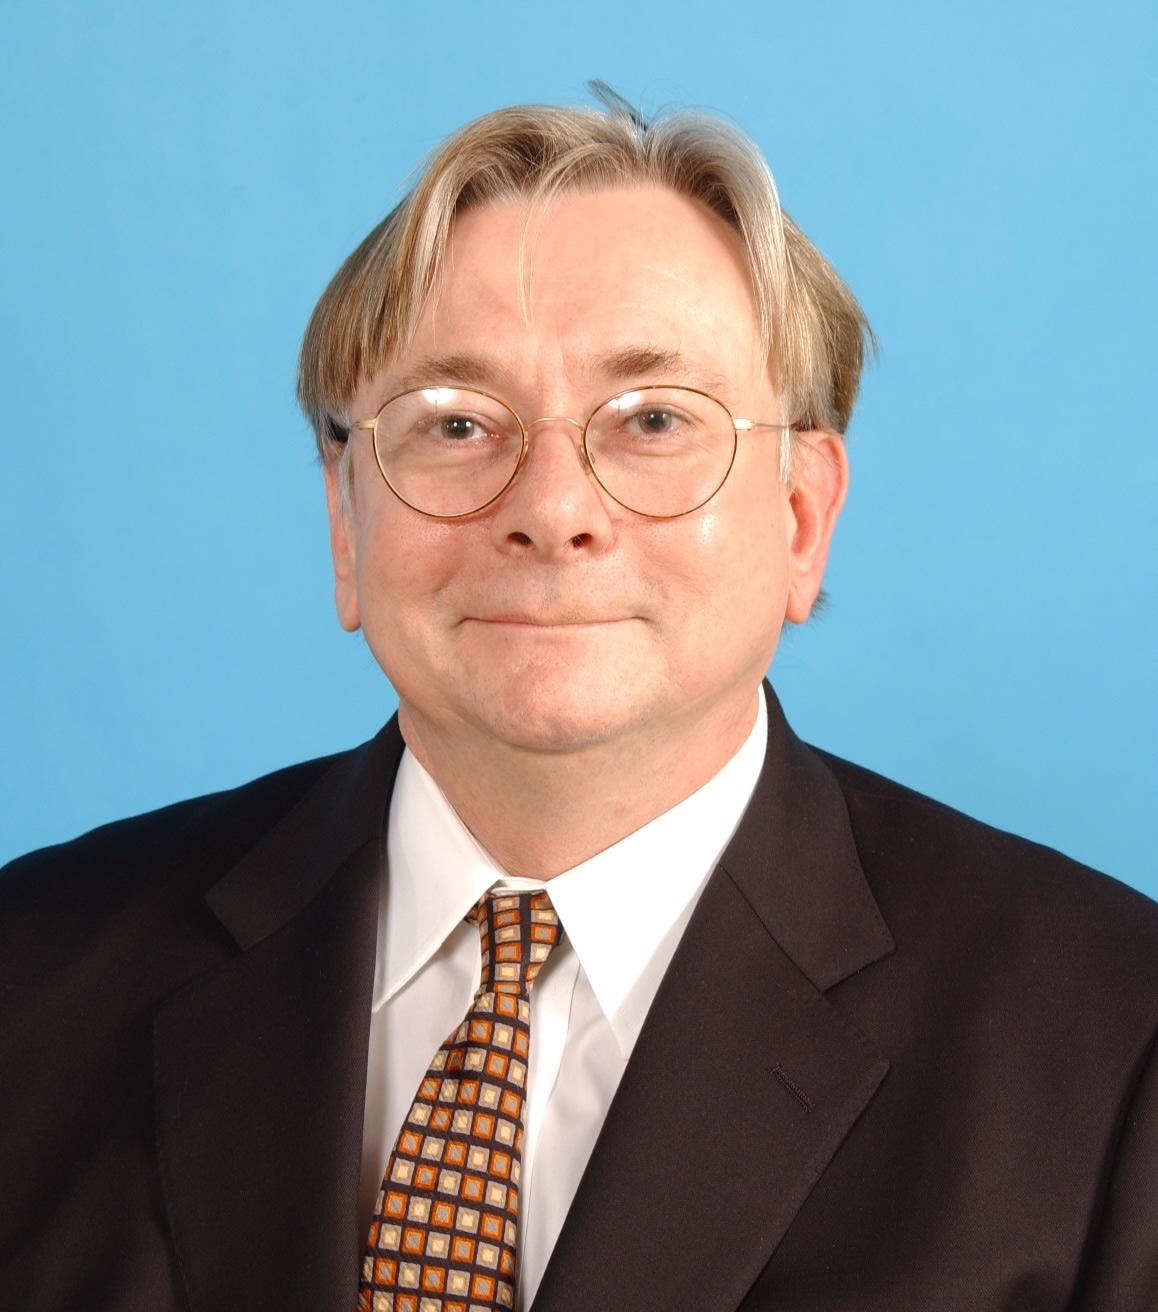 Professor Jeremy Somers Wilson